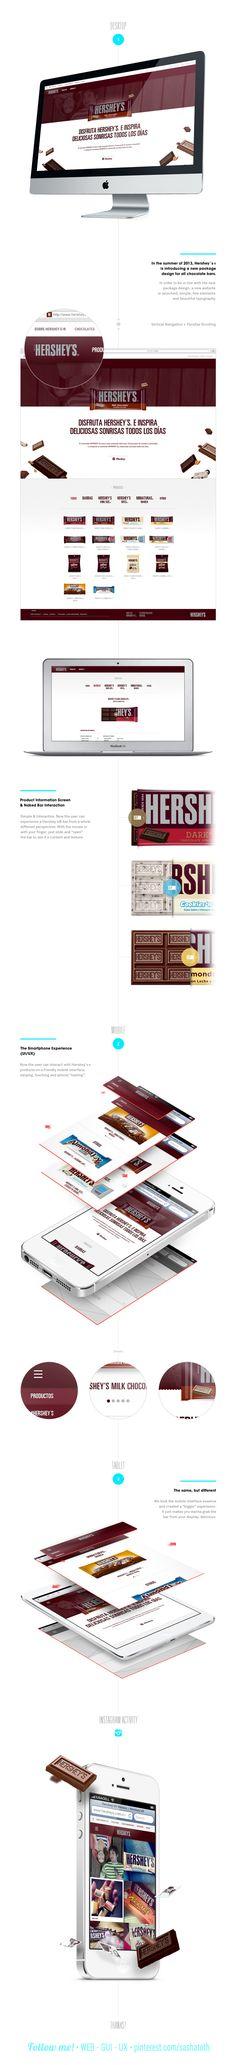 Hershey´s® Franchise by Manuel Navarro Orozco, via Behance *** #web #design #behance